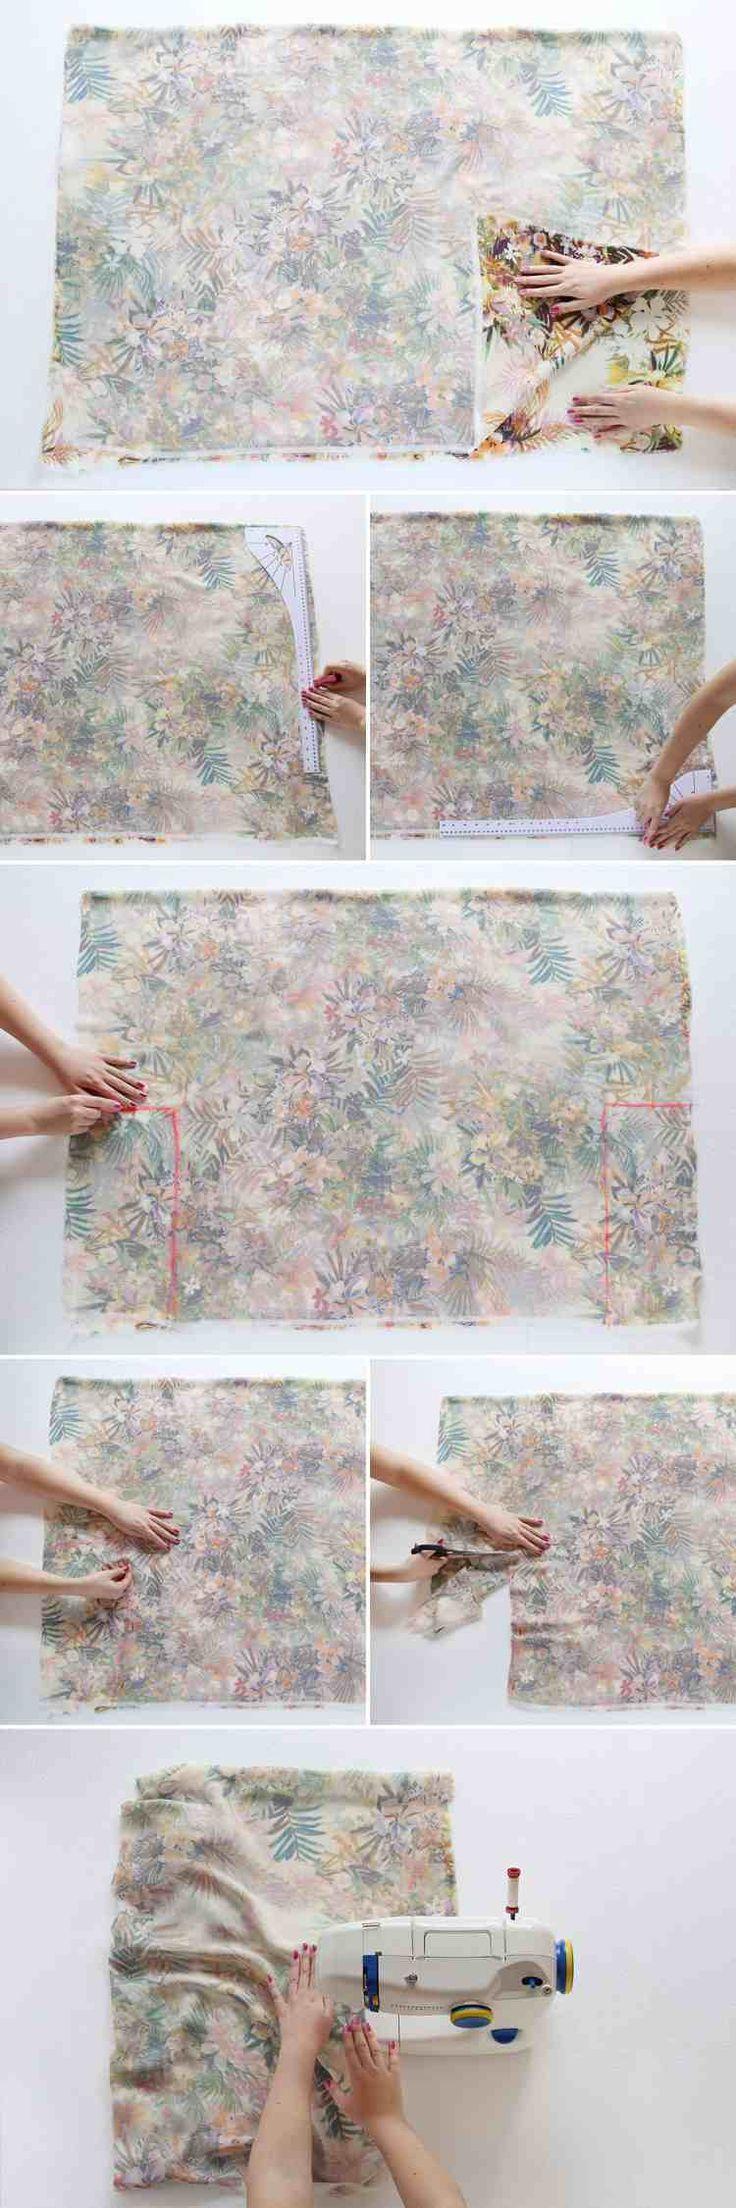 veste kimono femme DIY étape par étape